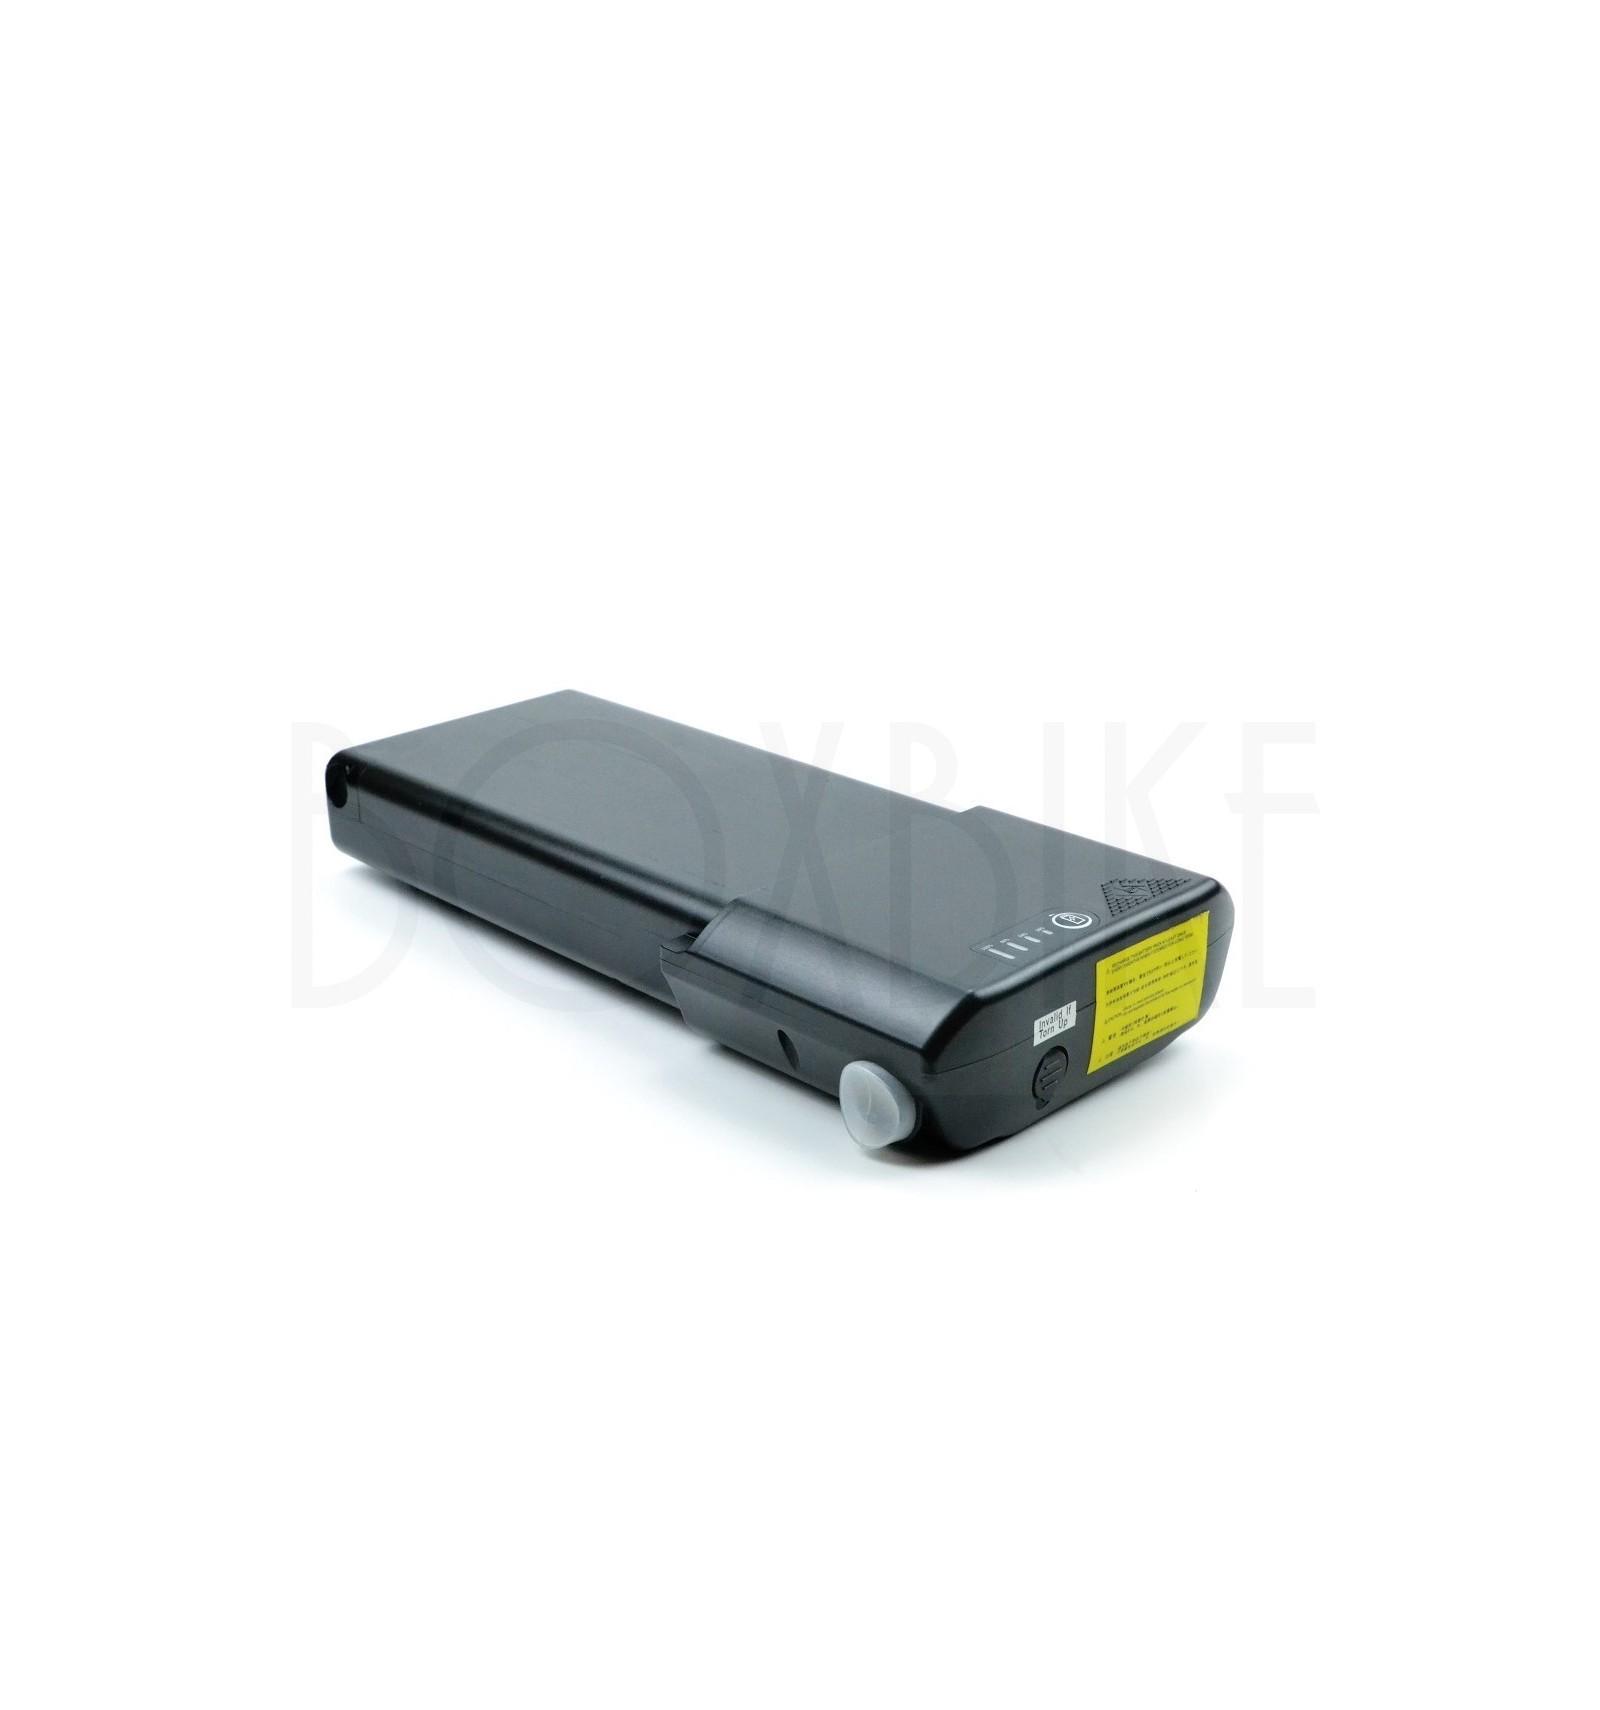 batavus elcykel batteri pris